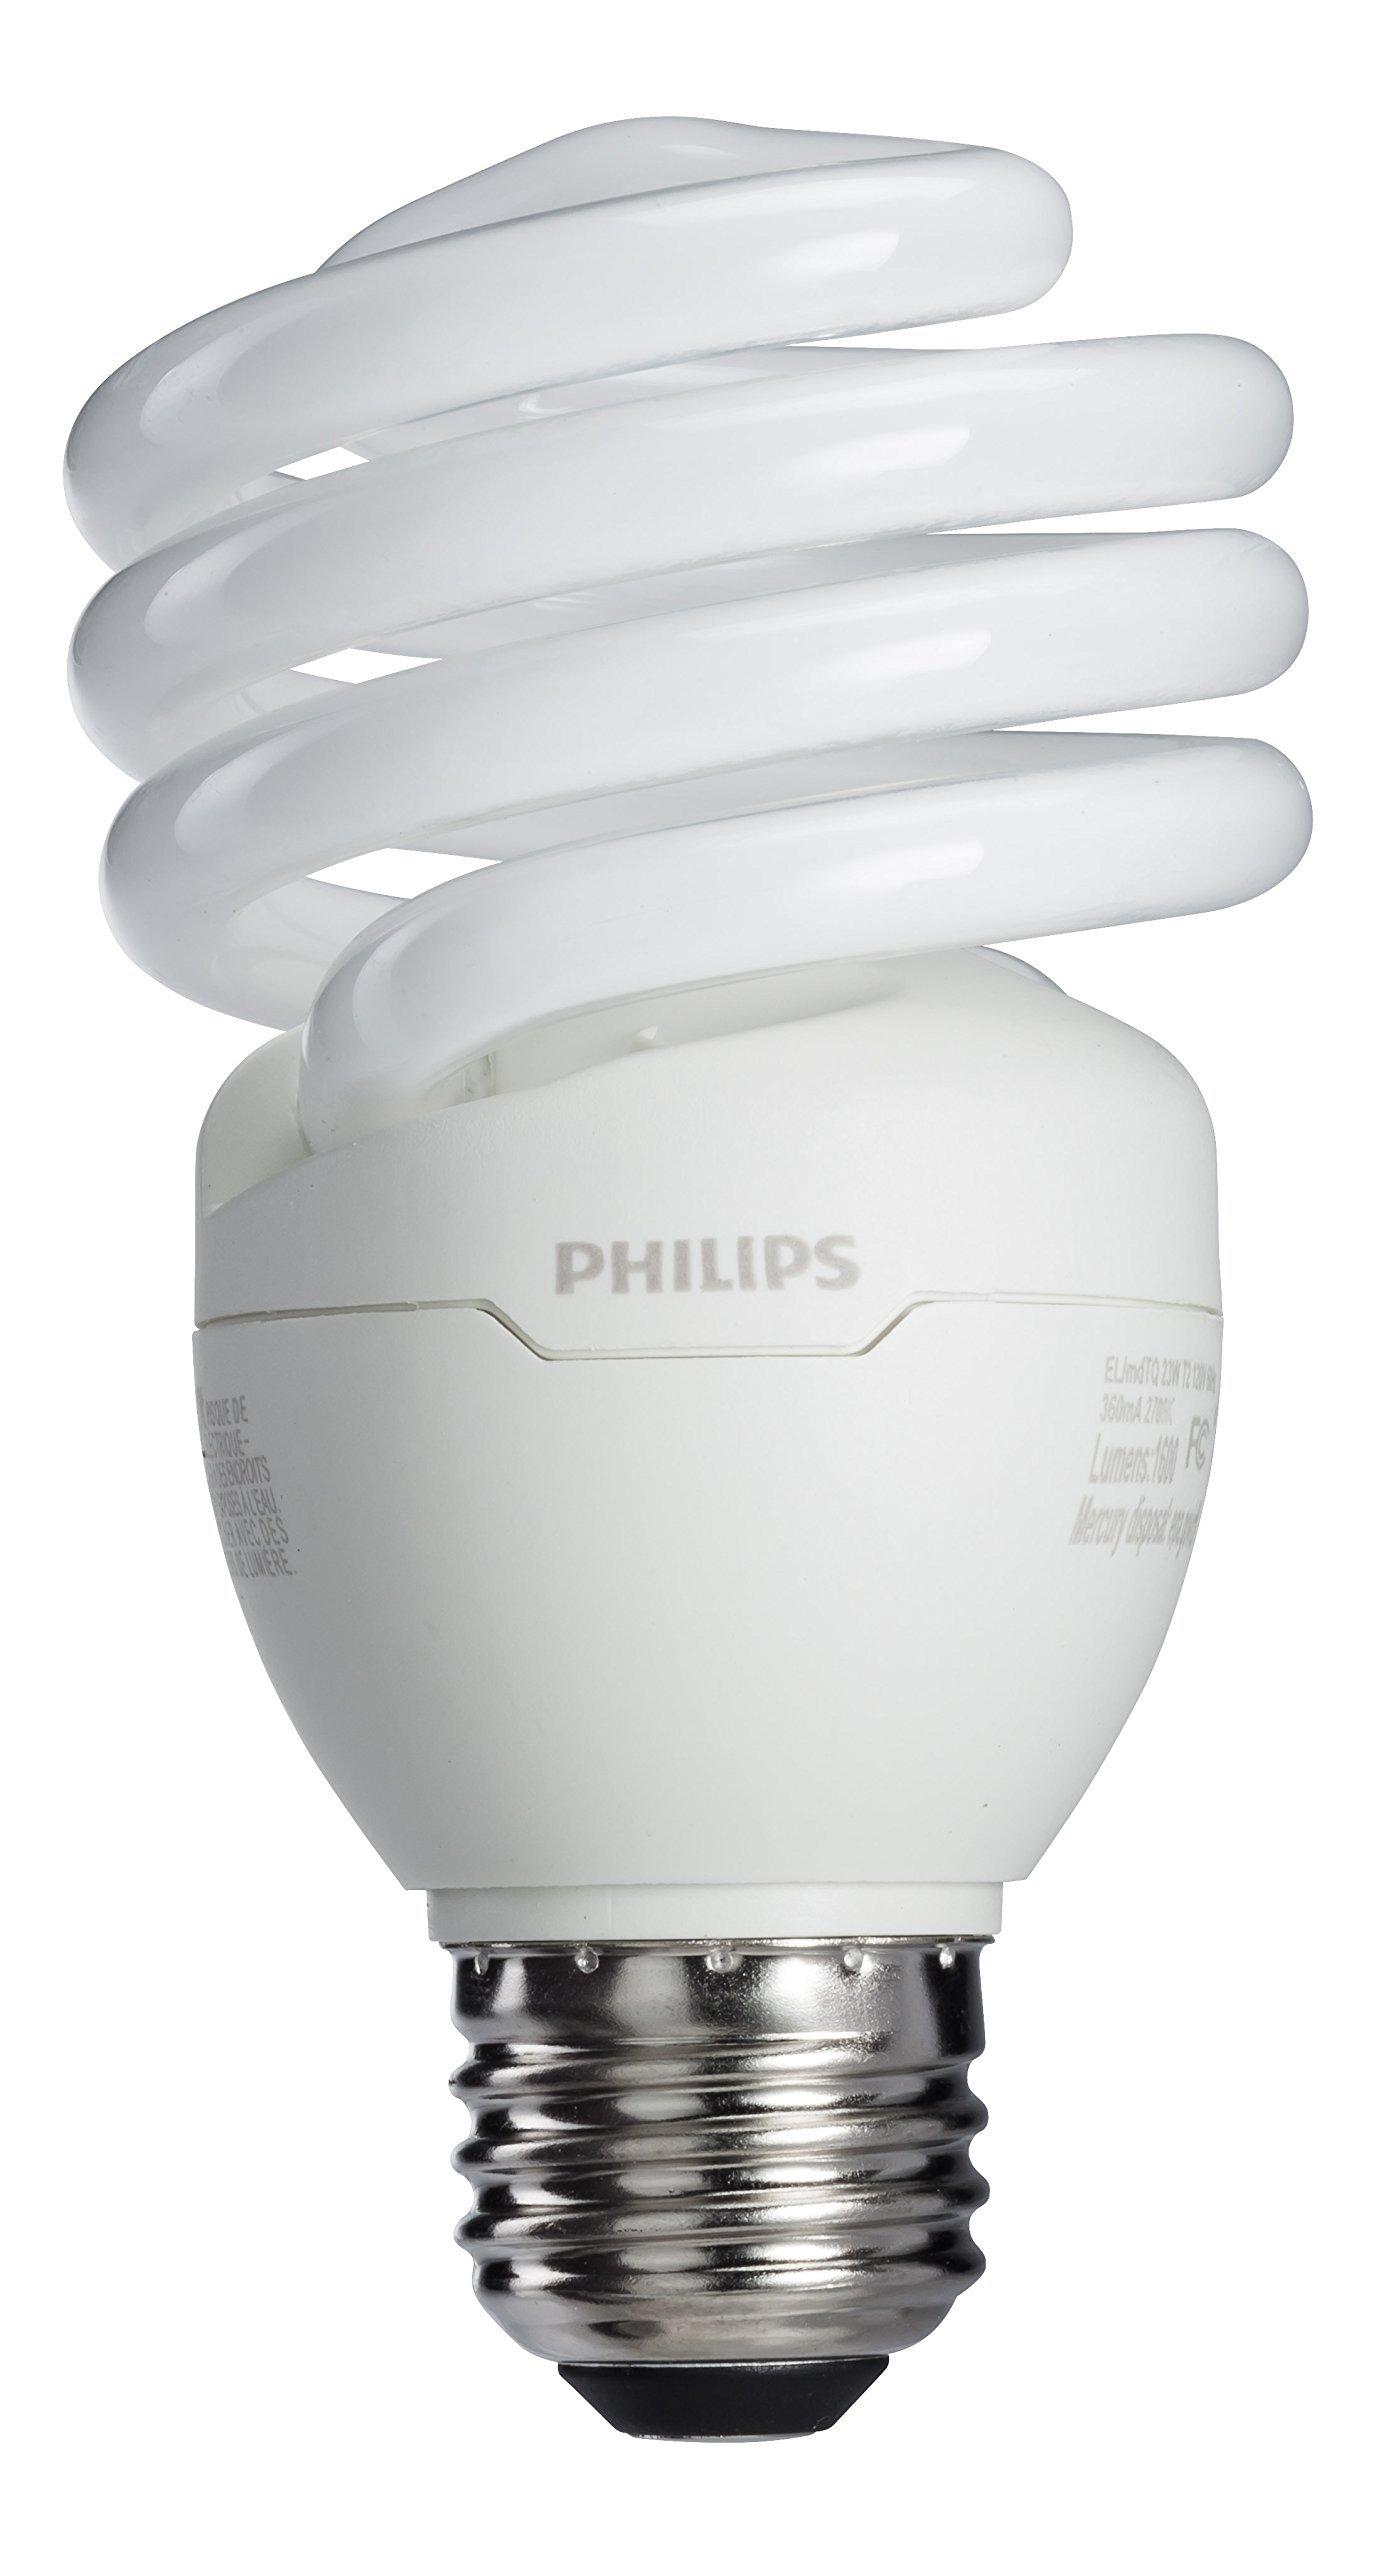 Philips 417097 Energy Saver 23-Watt 100W Soft White CFL Light Bulb, 4-Pack by Philips (Image #1)